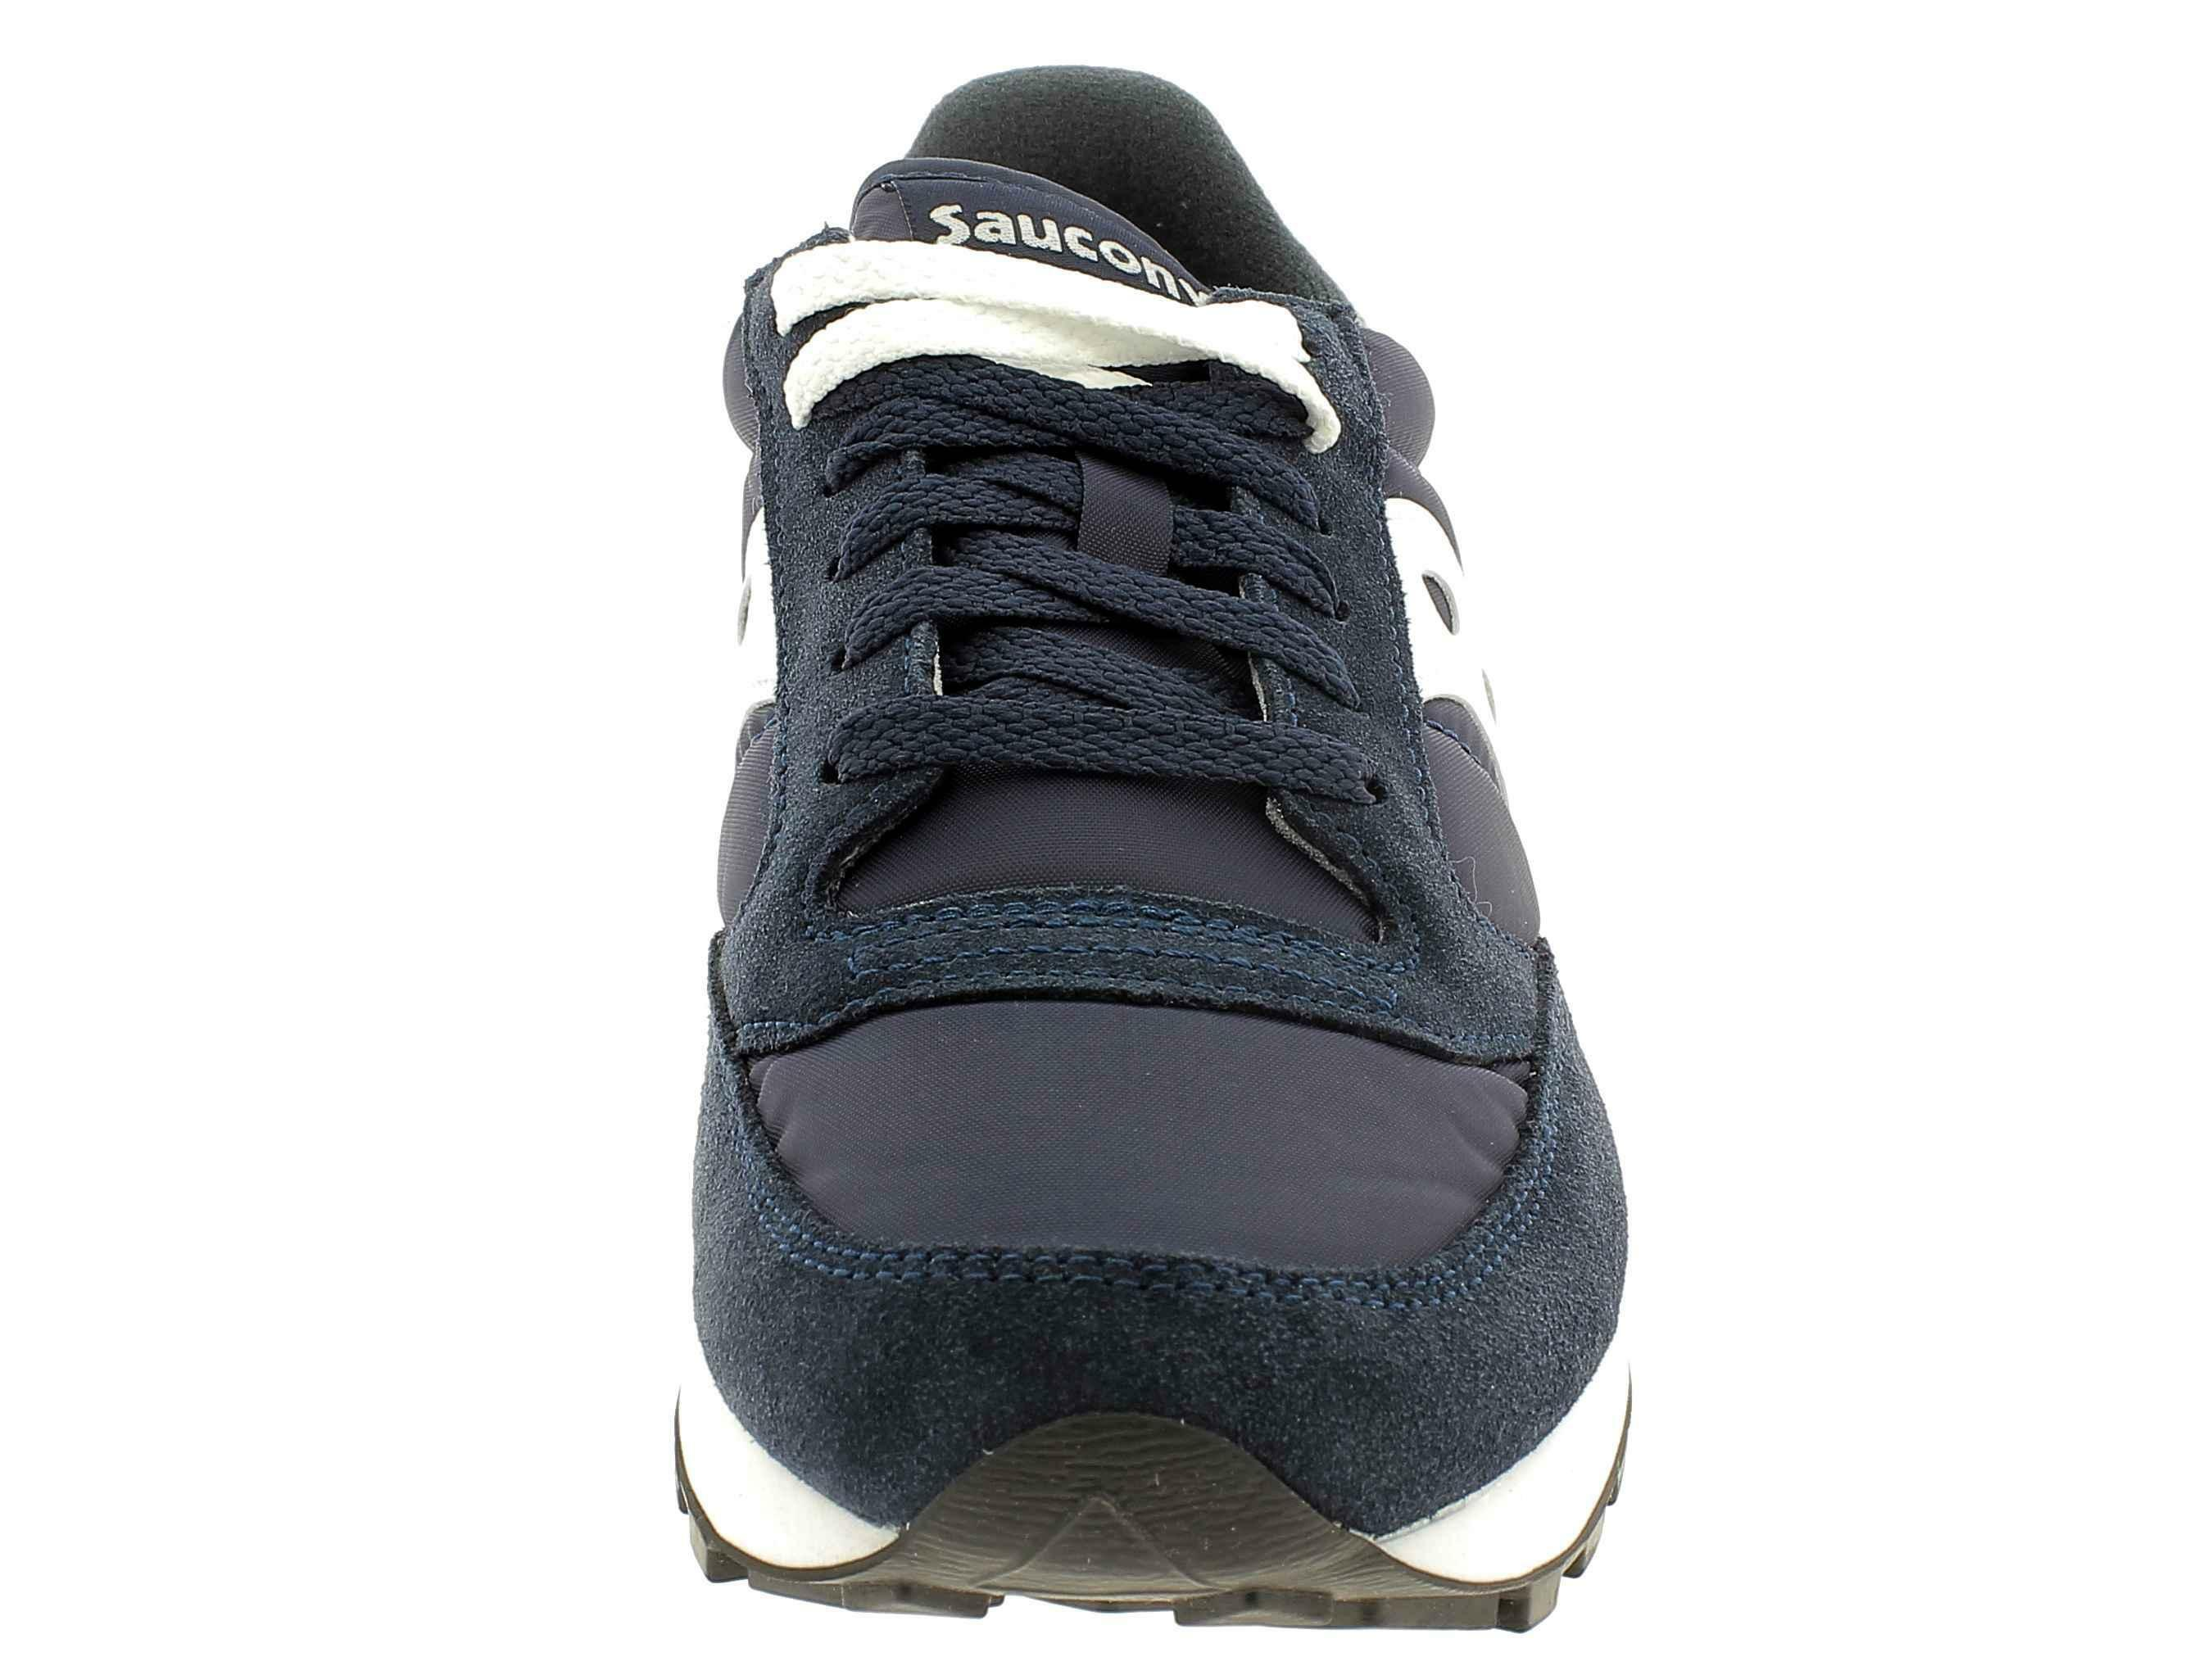 saucony saucony jazz original scarpe uomo blu